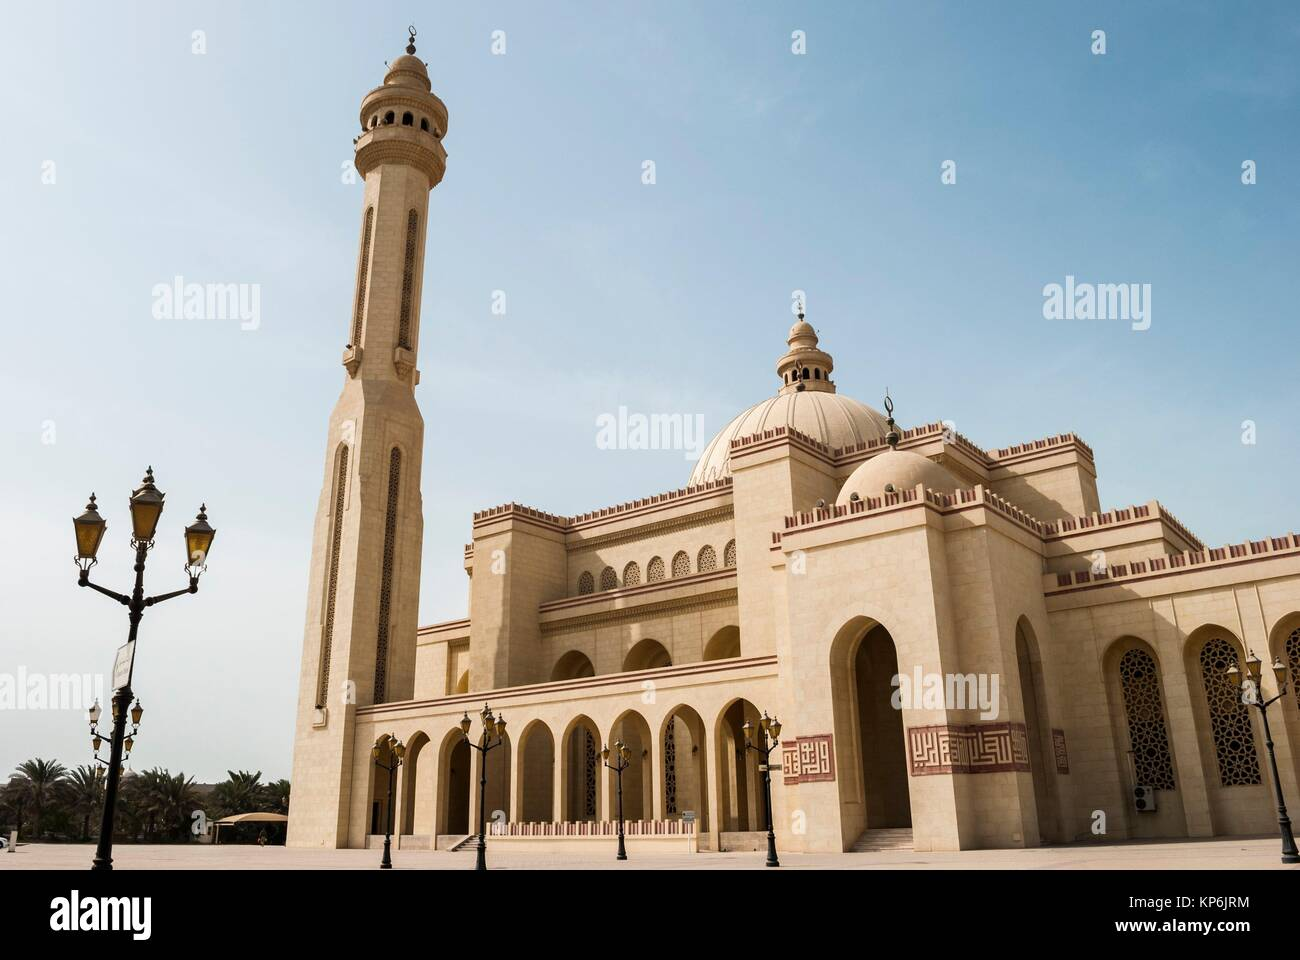 Grande mosquée Al Fateh, Manama, Bahreïn, Emirats Arabes Unis. Photo Stock